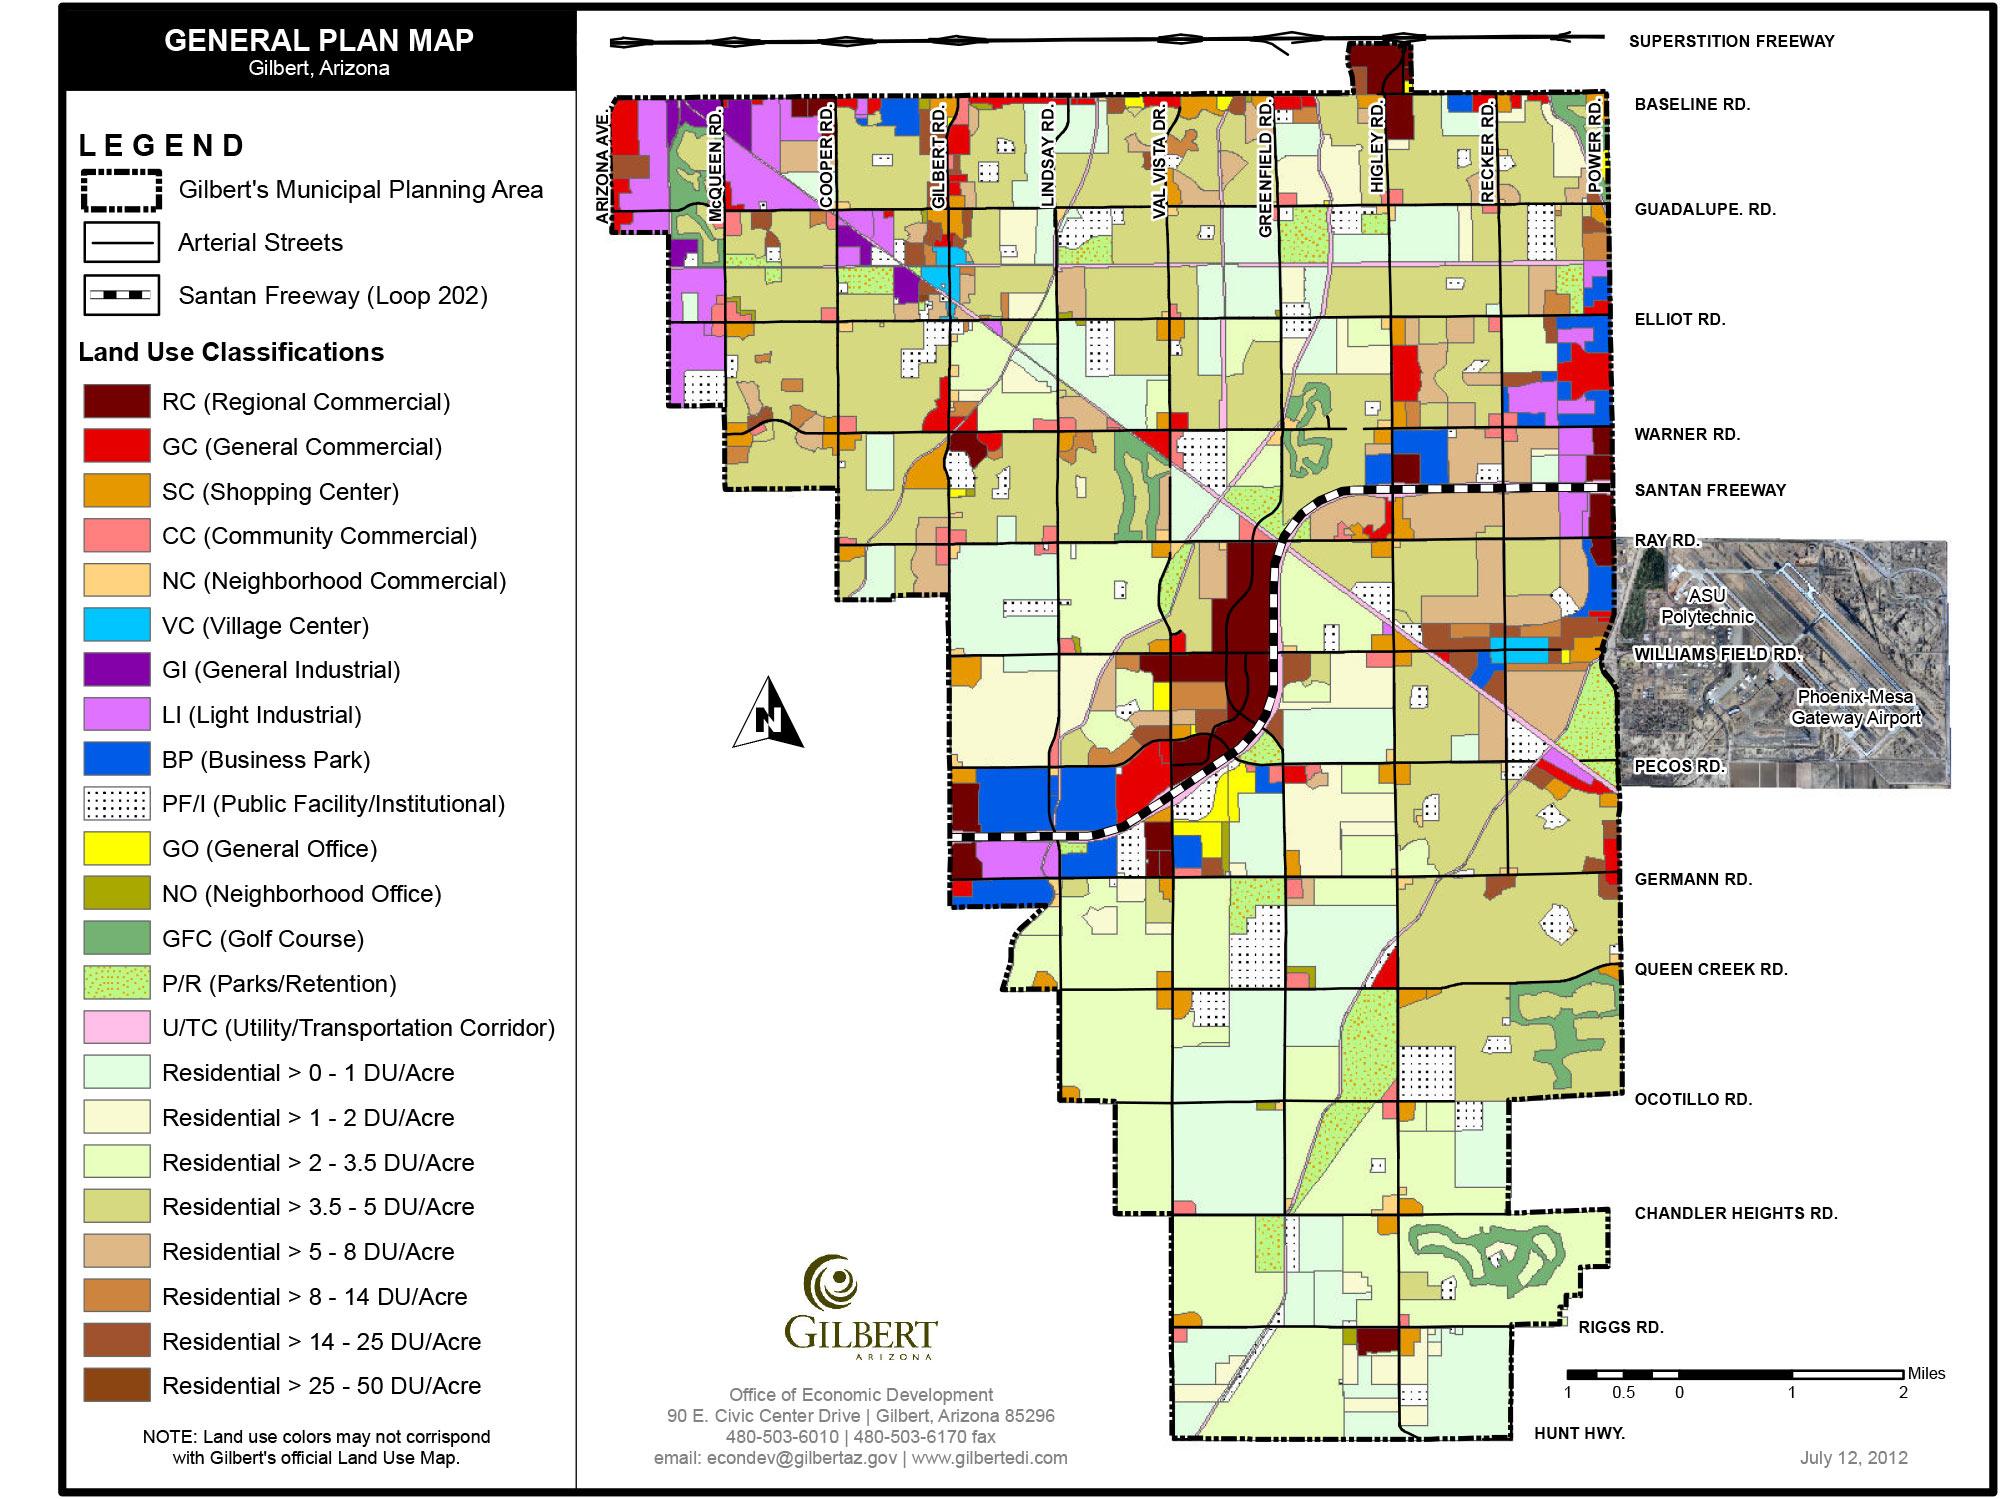 Map Of Arizona Gilbert.Gilbert Maps Gilbert Arizona Economic Development